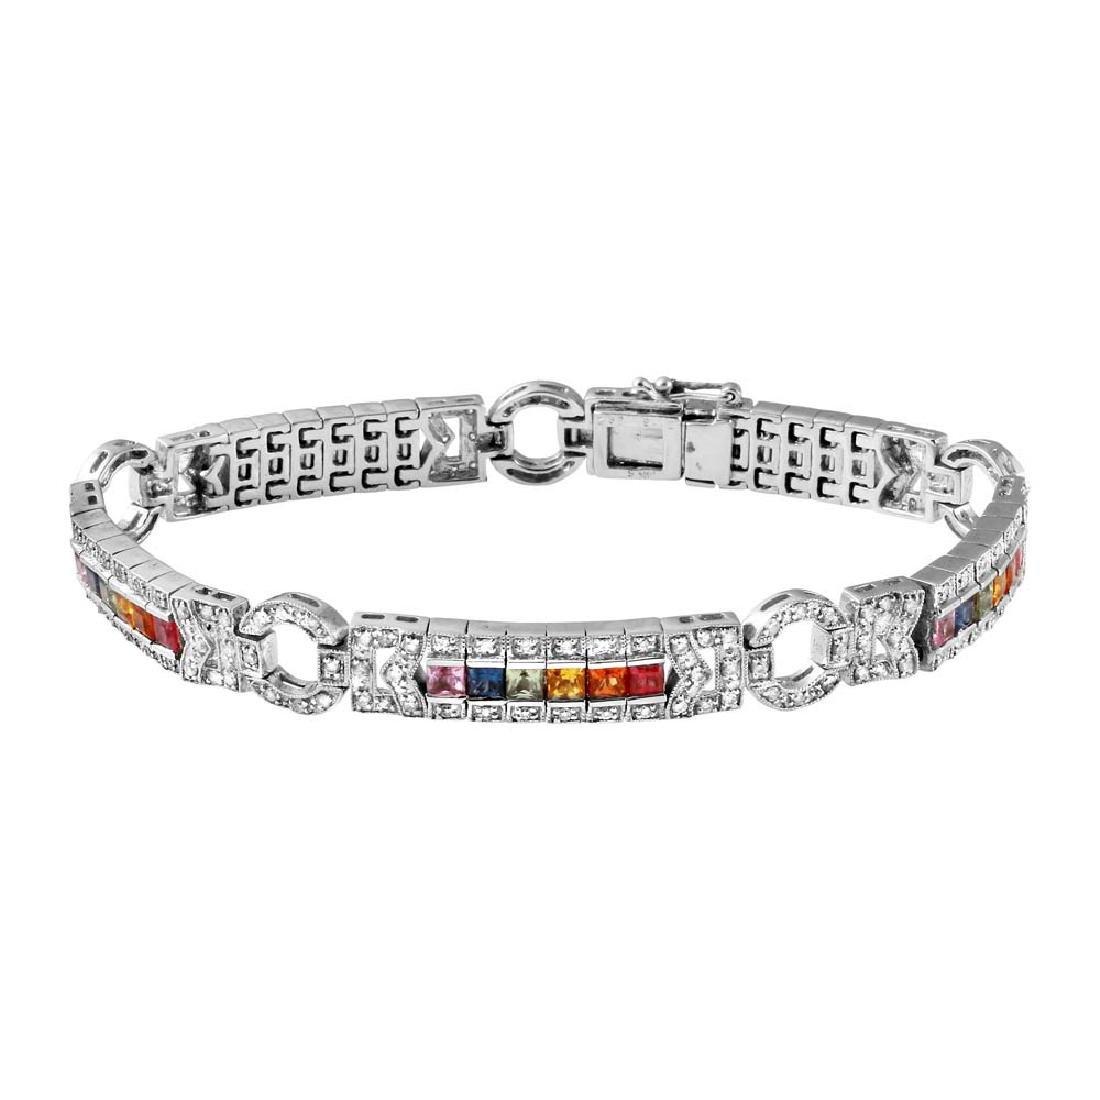 Genuine 4.97 TCW 14K White Gold Ladies Bracelet